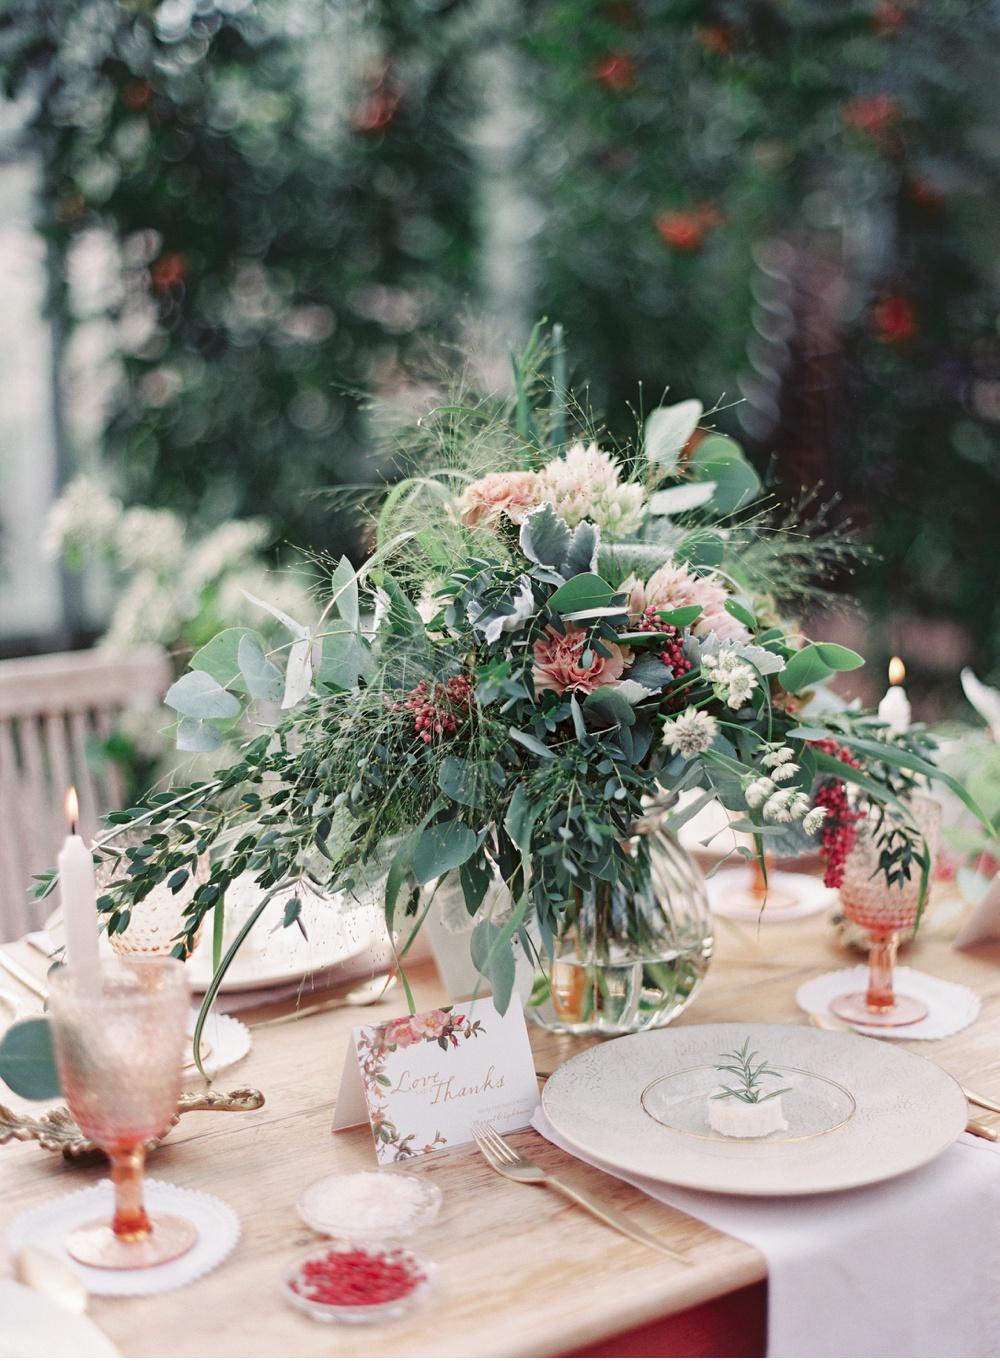 Greenhouse_wedding_inspiration©MadalinaSheldon_0002.jpg